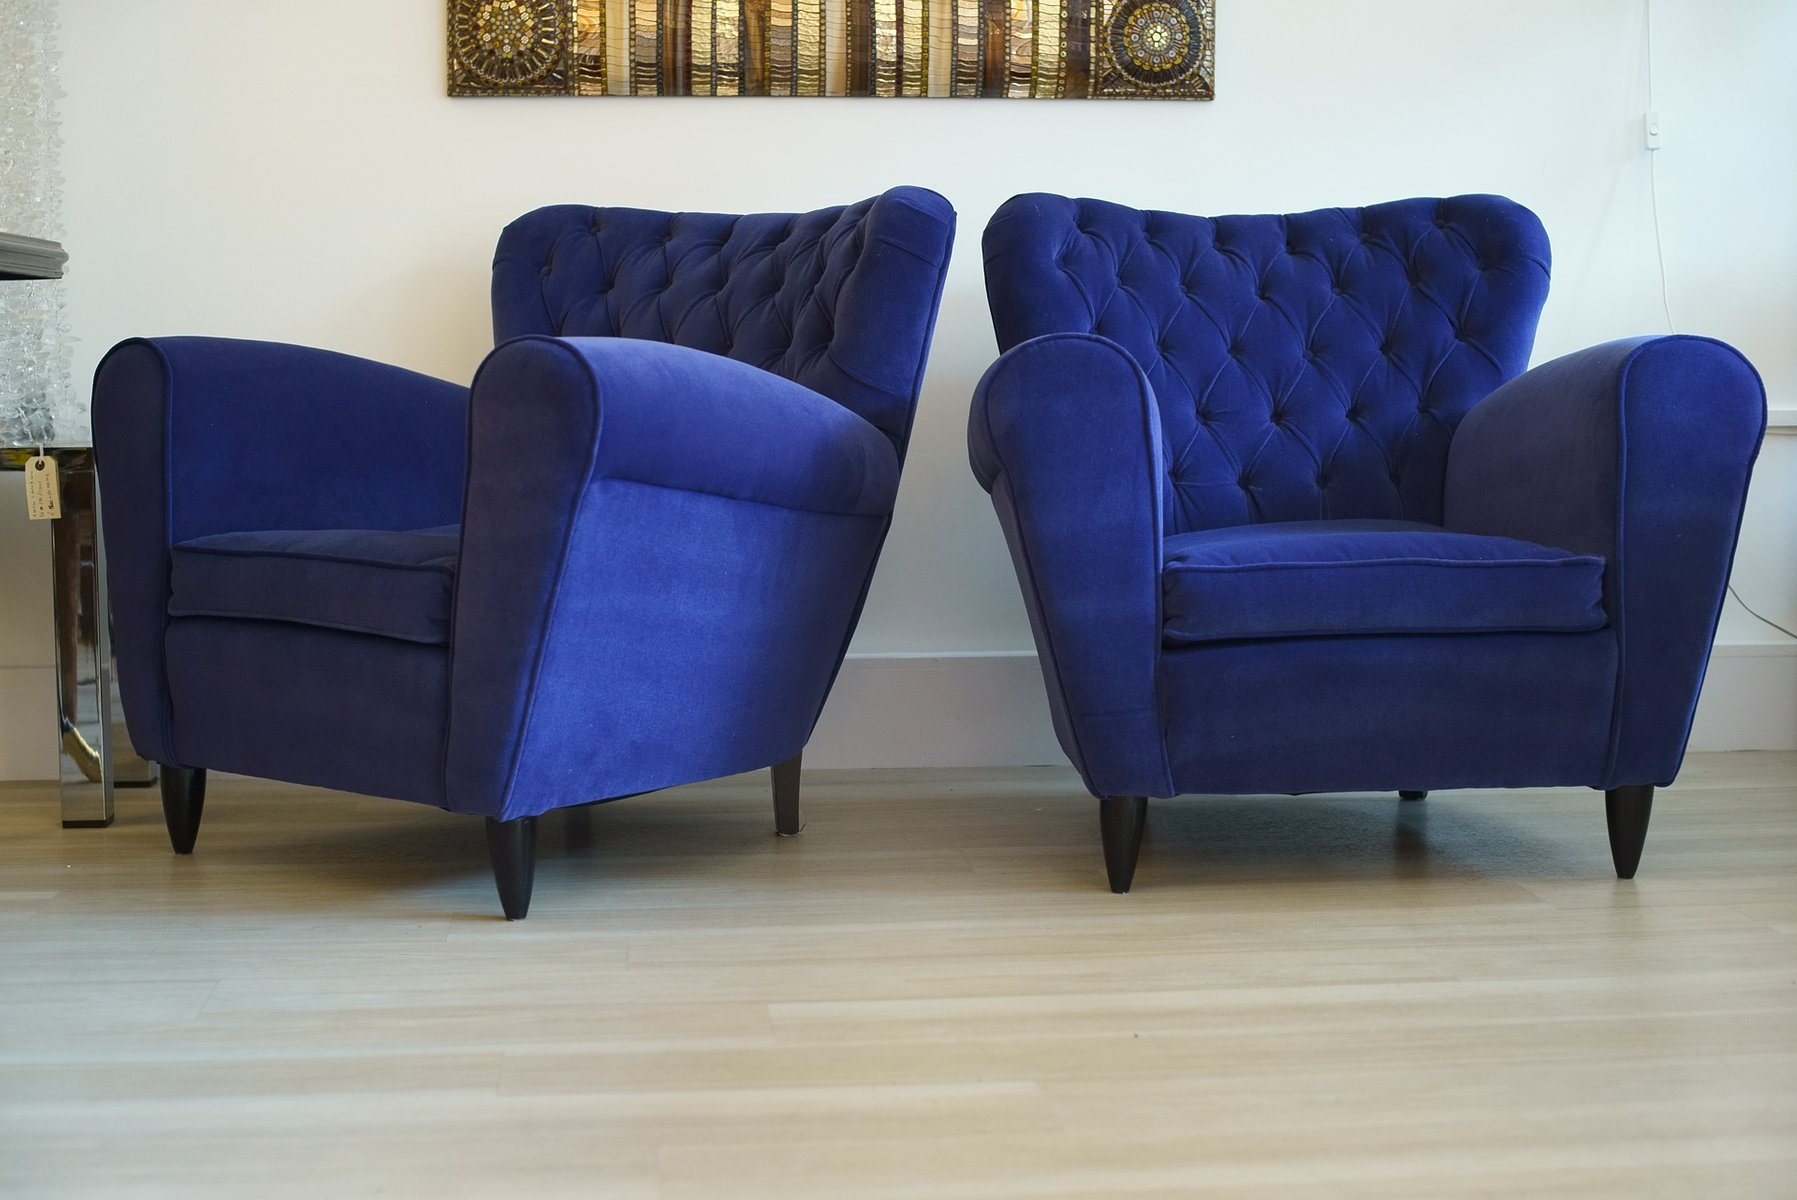 blaue samtsessel von gugliemo ulrich 1950er 2er set bei. Black Bedroom Furniture Sets. Home Design Ideas